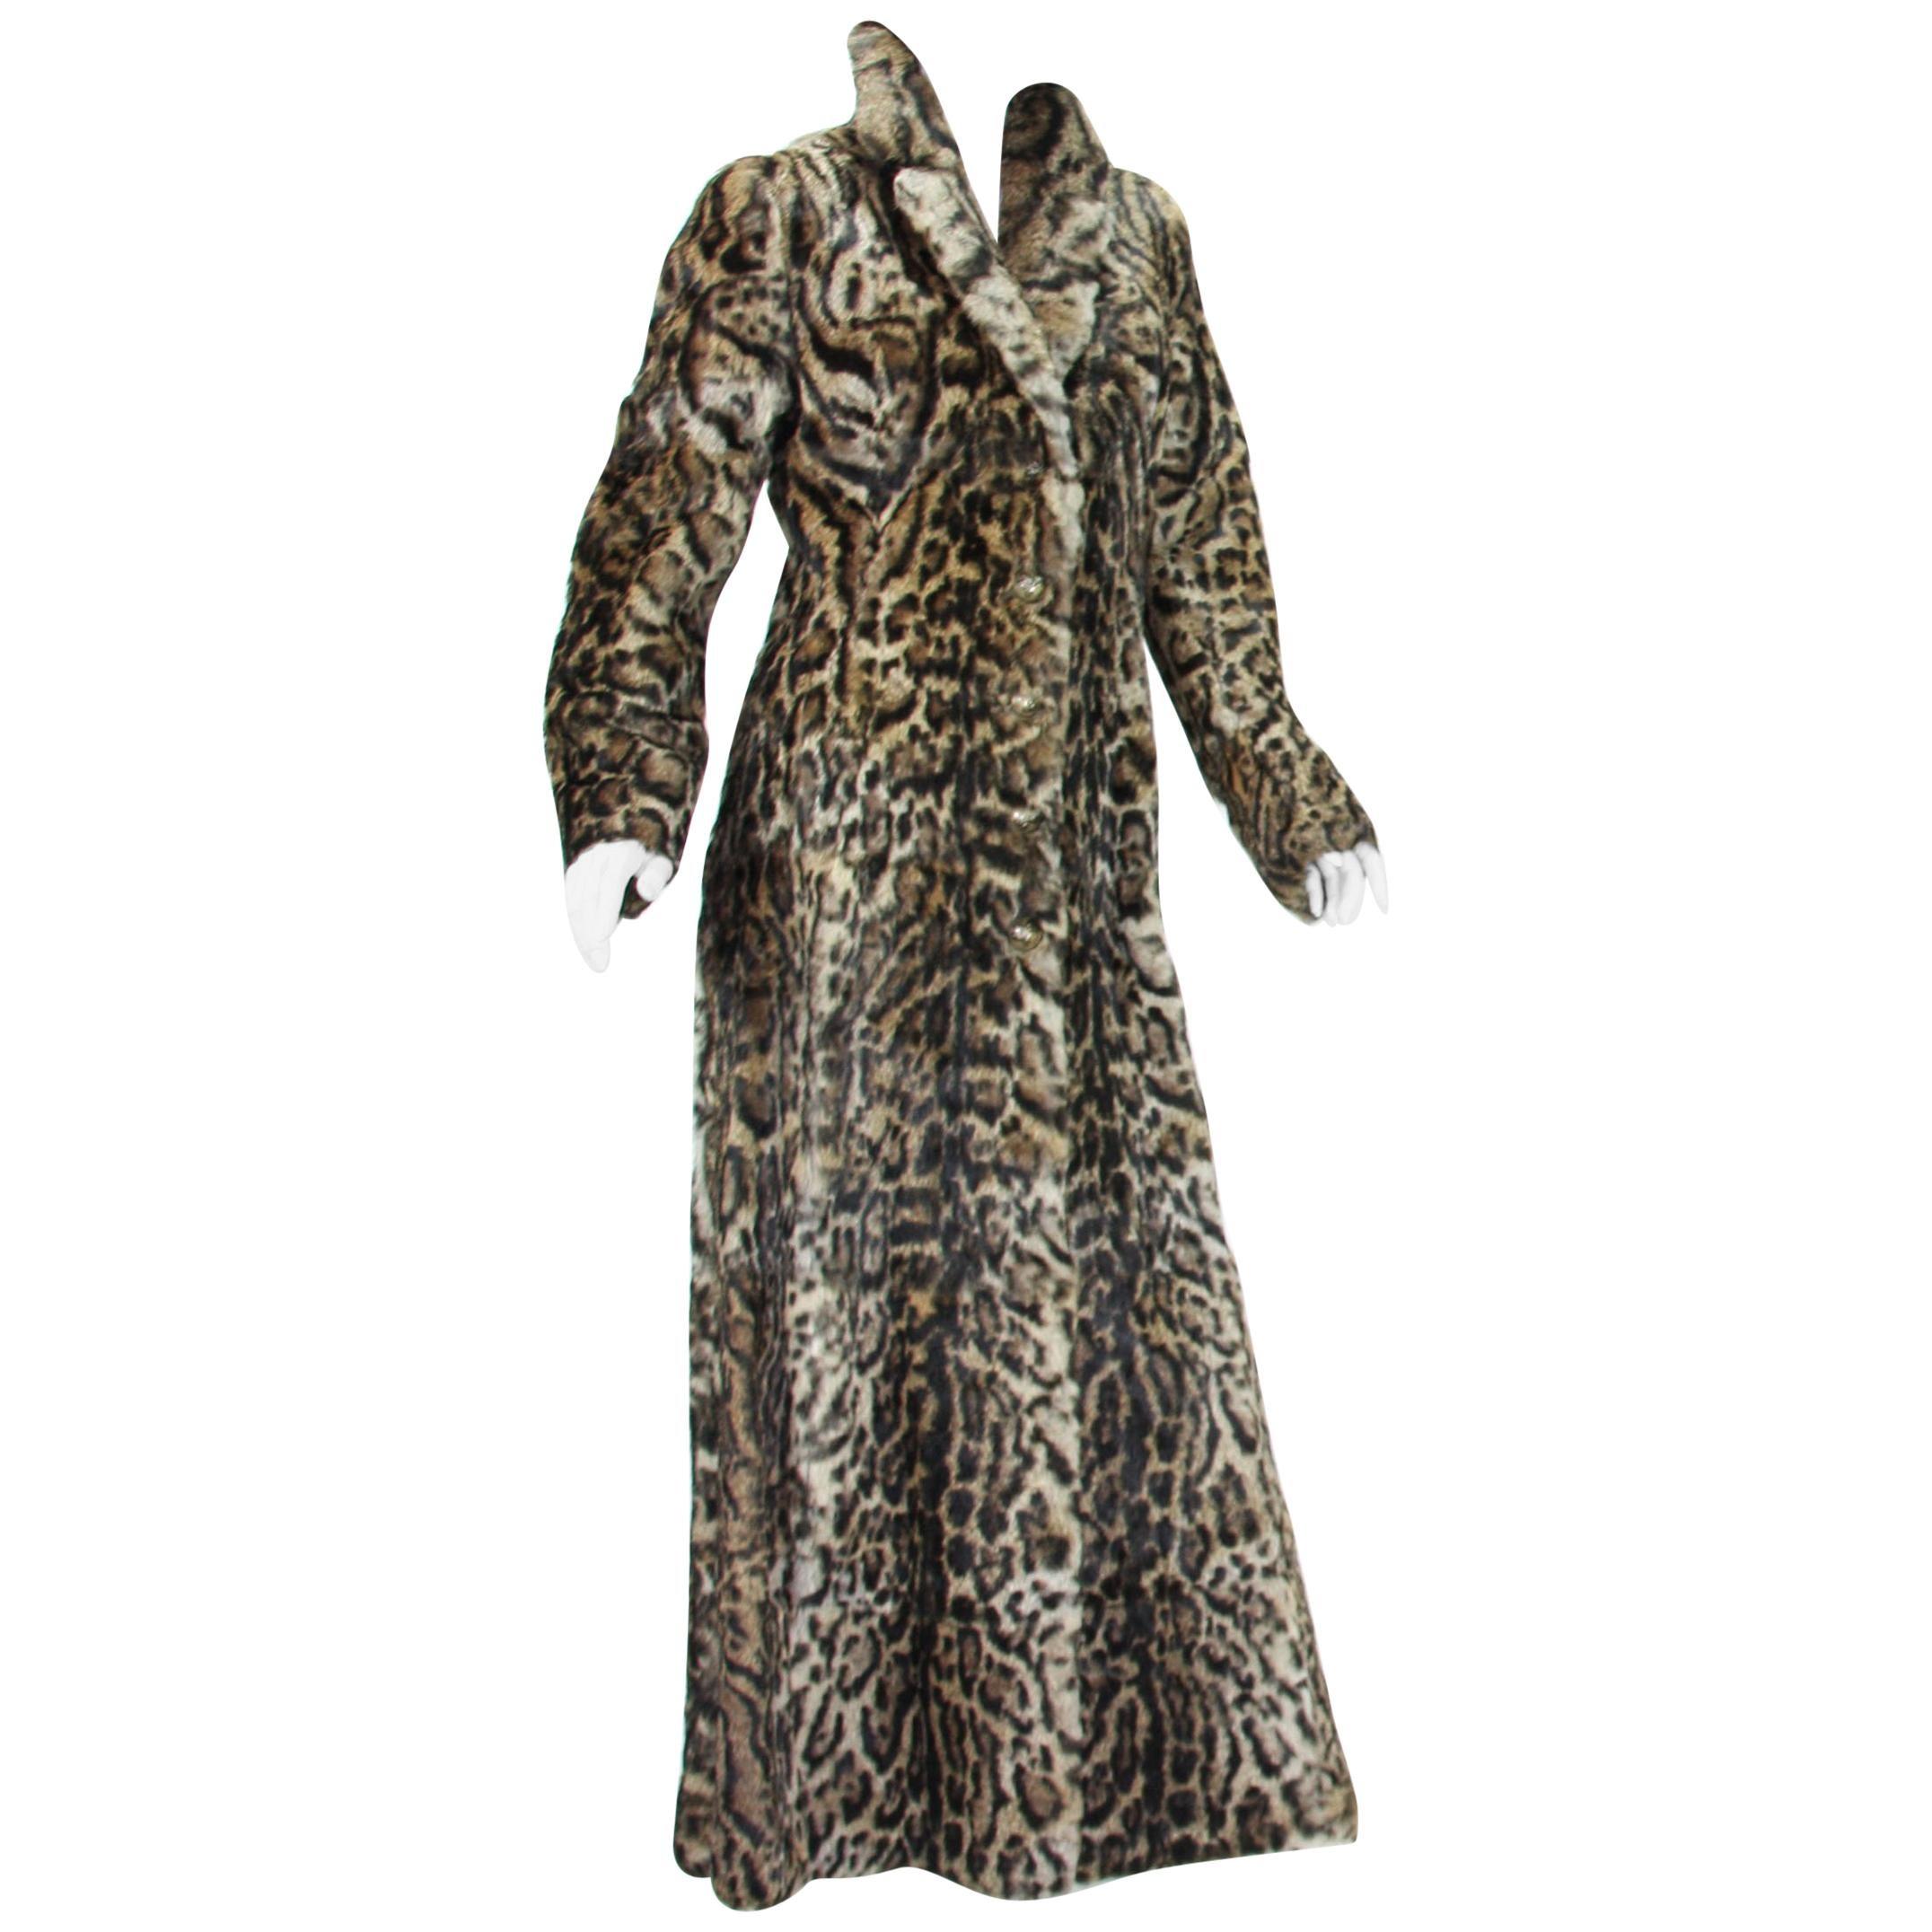 New Roberto Cavalli Runway F/W 2016 Collection Fur Long Leopard Print Coat  42